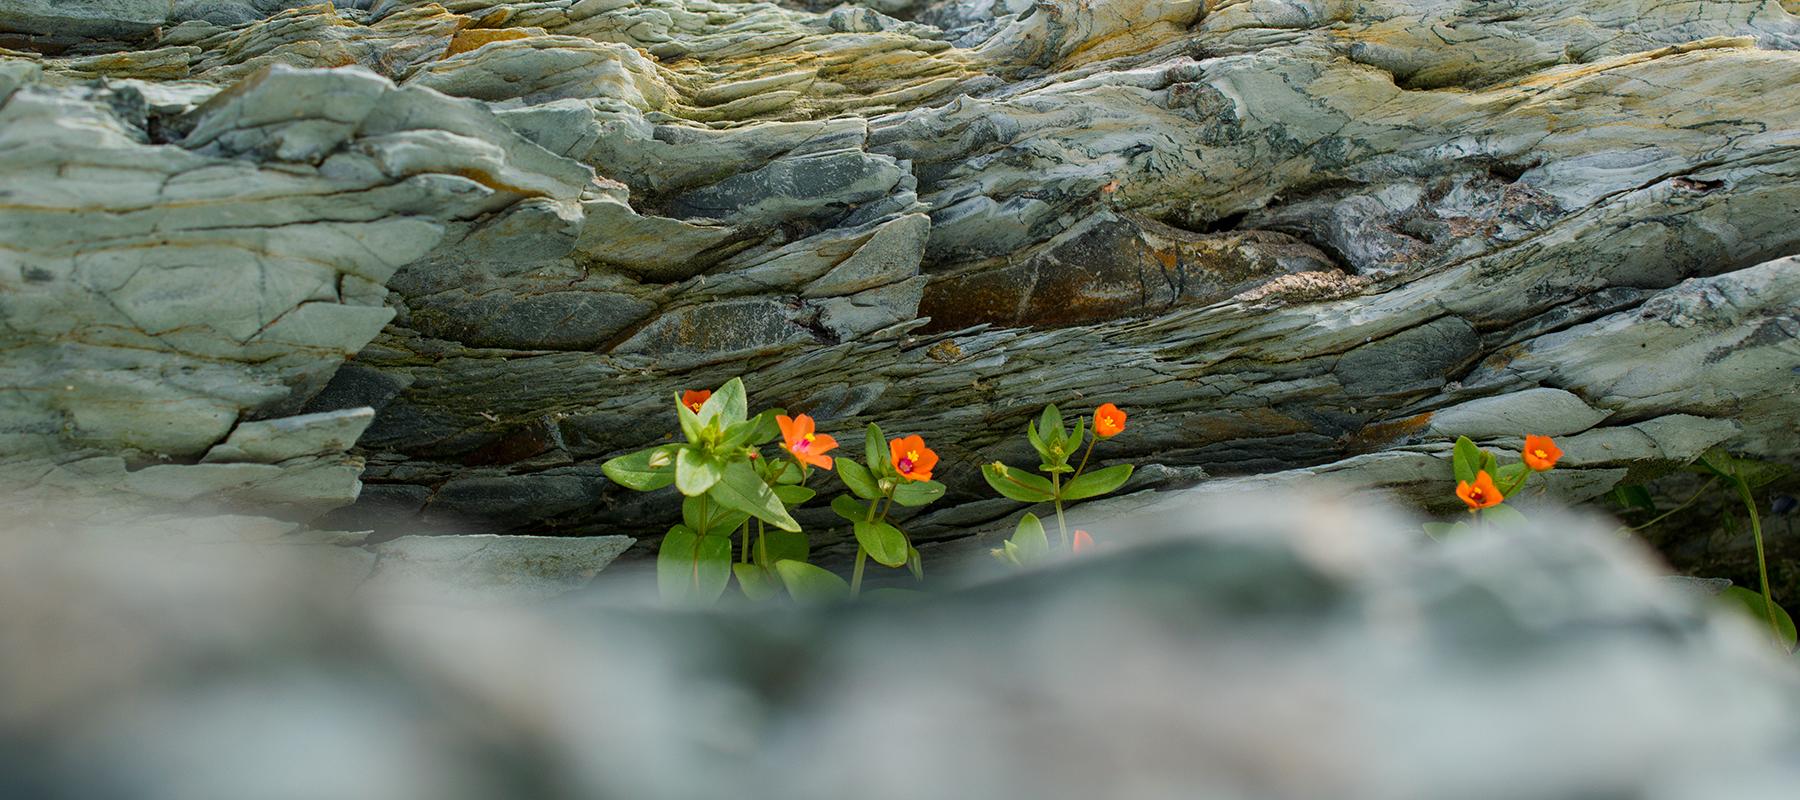 small orange flowers blooming in costal rock